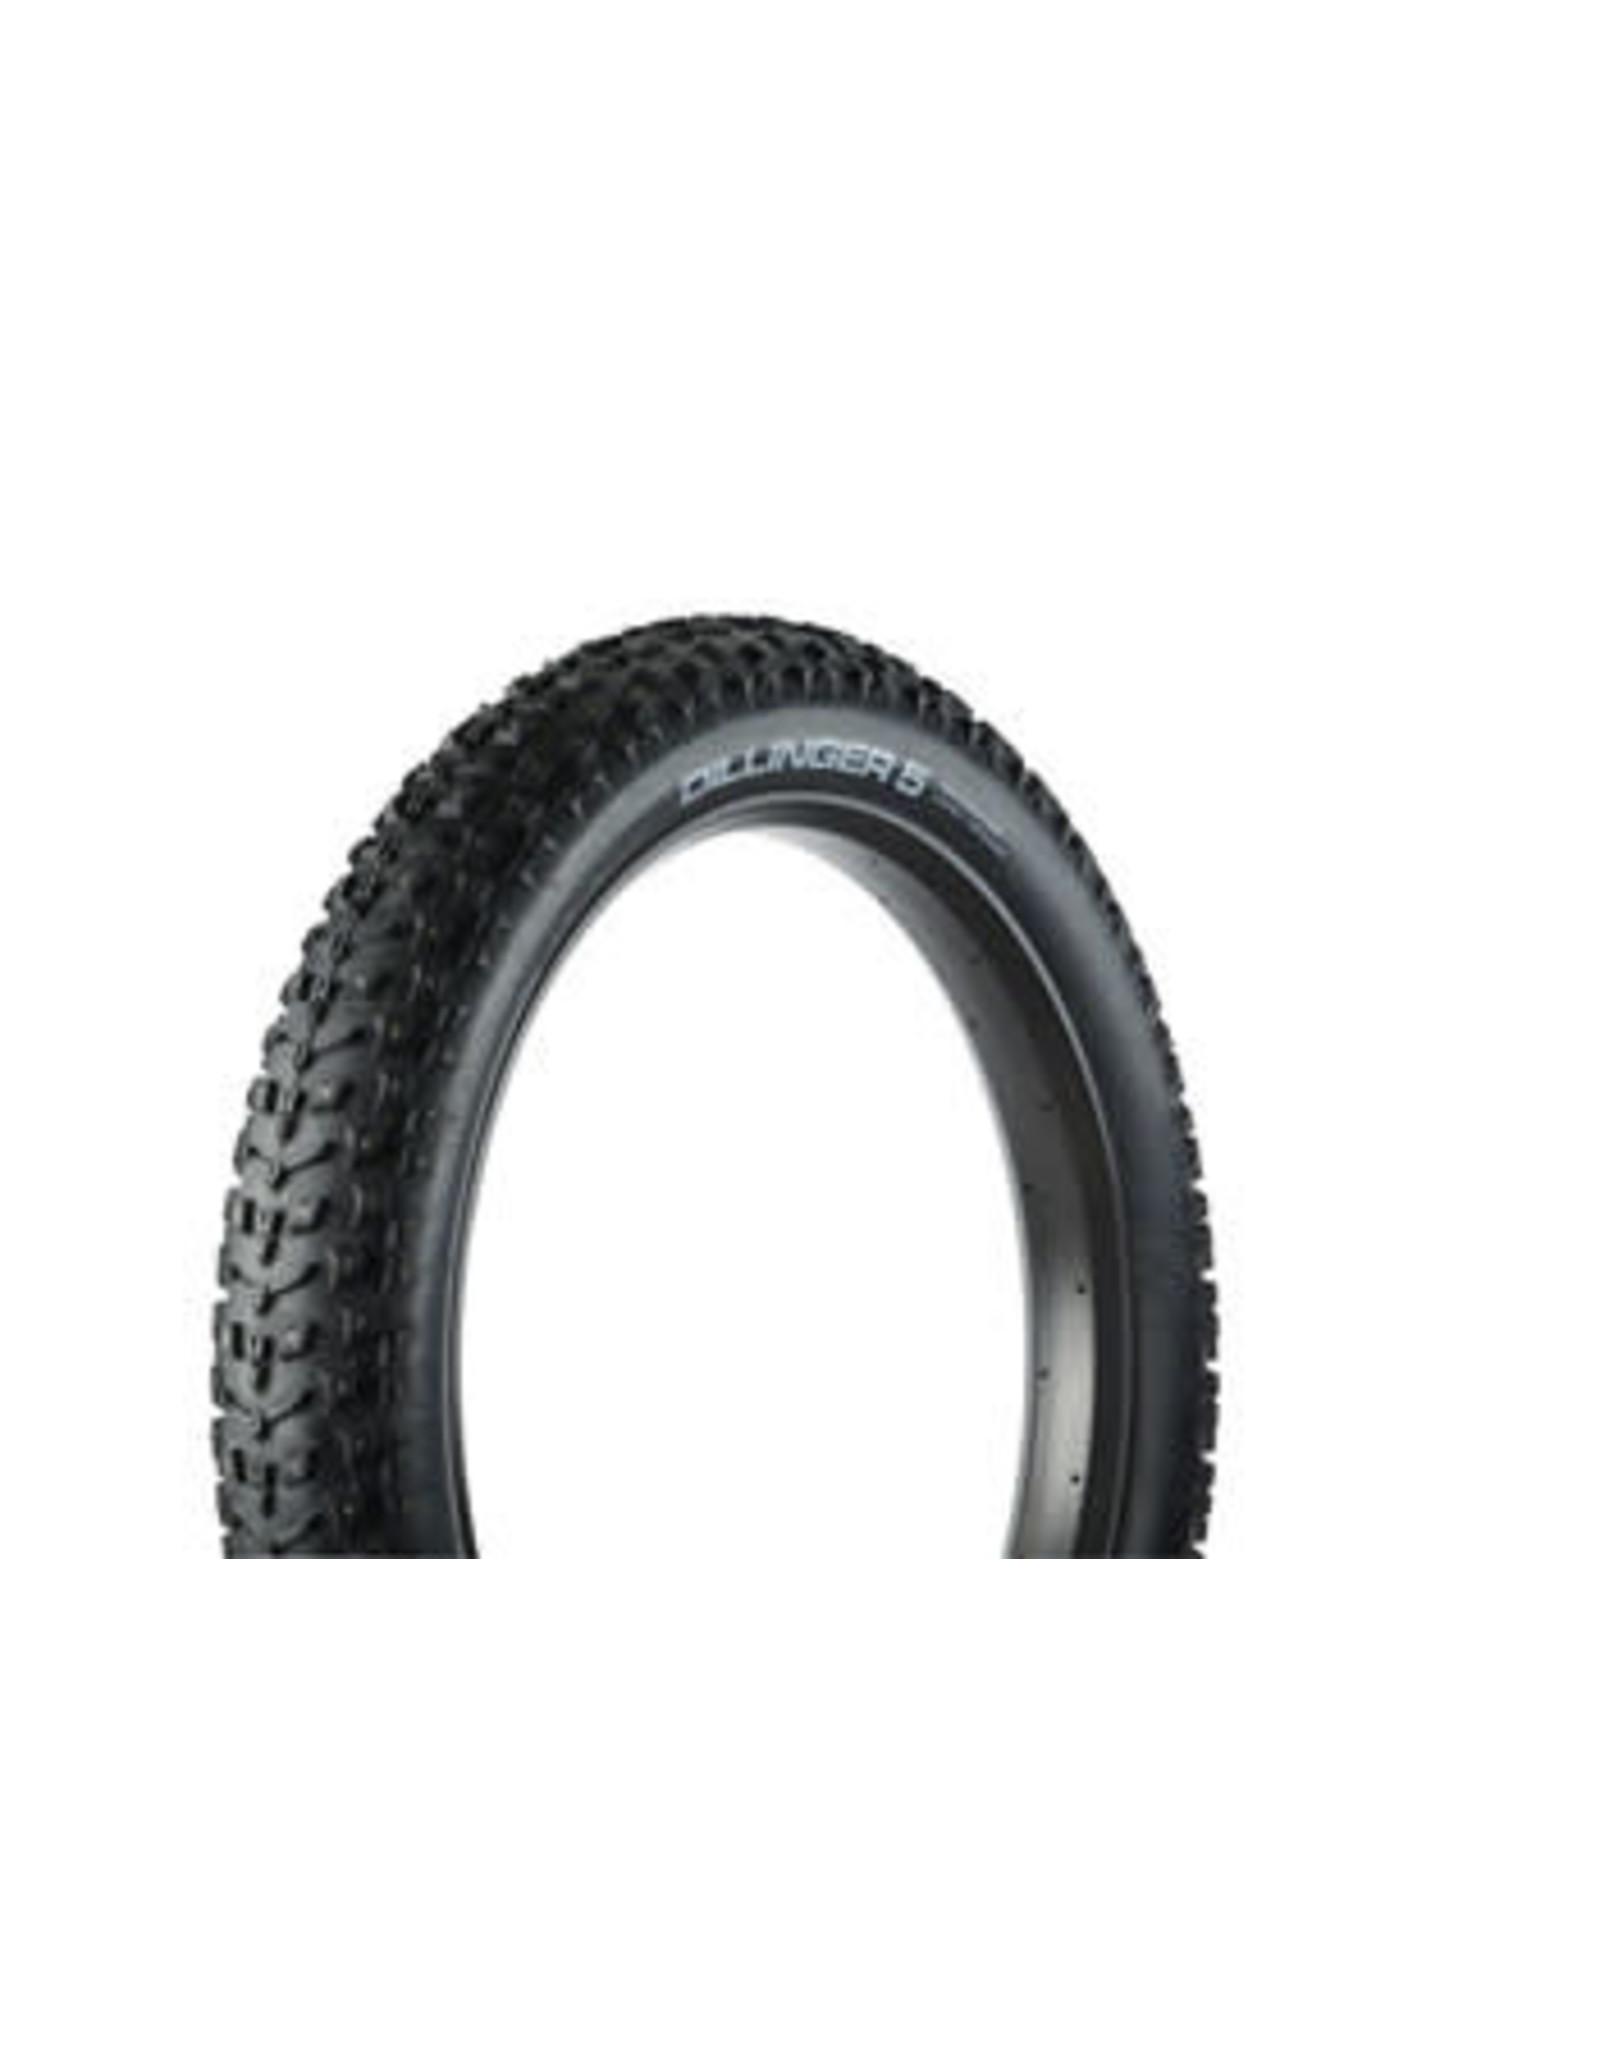 "45NRTH 45NRTH Dillinger 5 Studded Fat Bike Tire: 26 x 4.6"", 258 Steel Carbide Studs, Tubeless Ready Folding, 60tpi, Black"